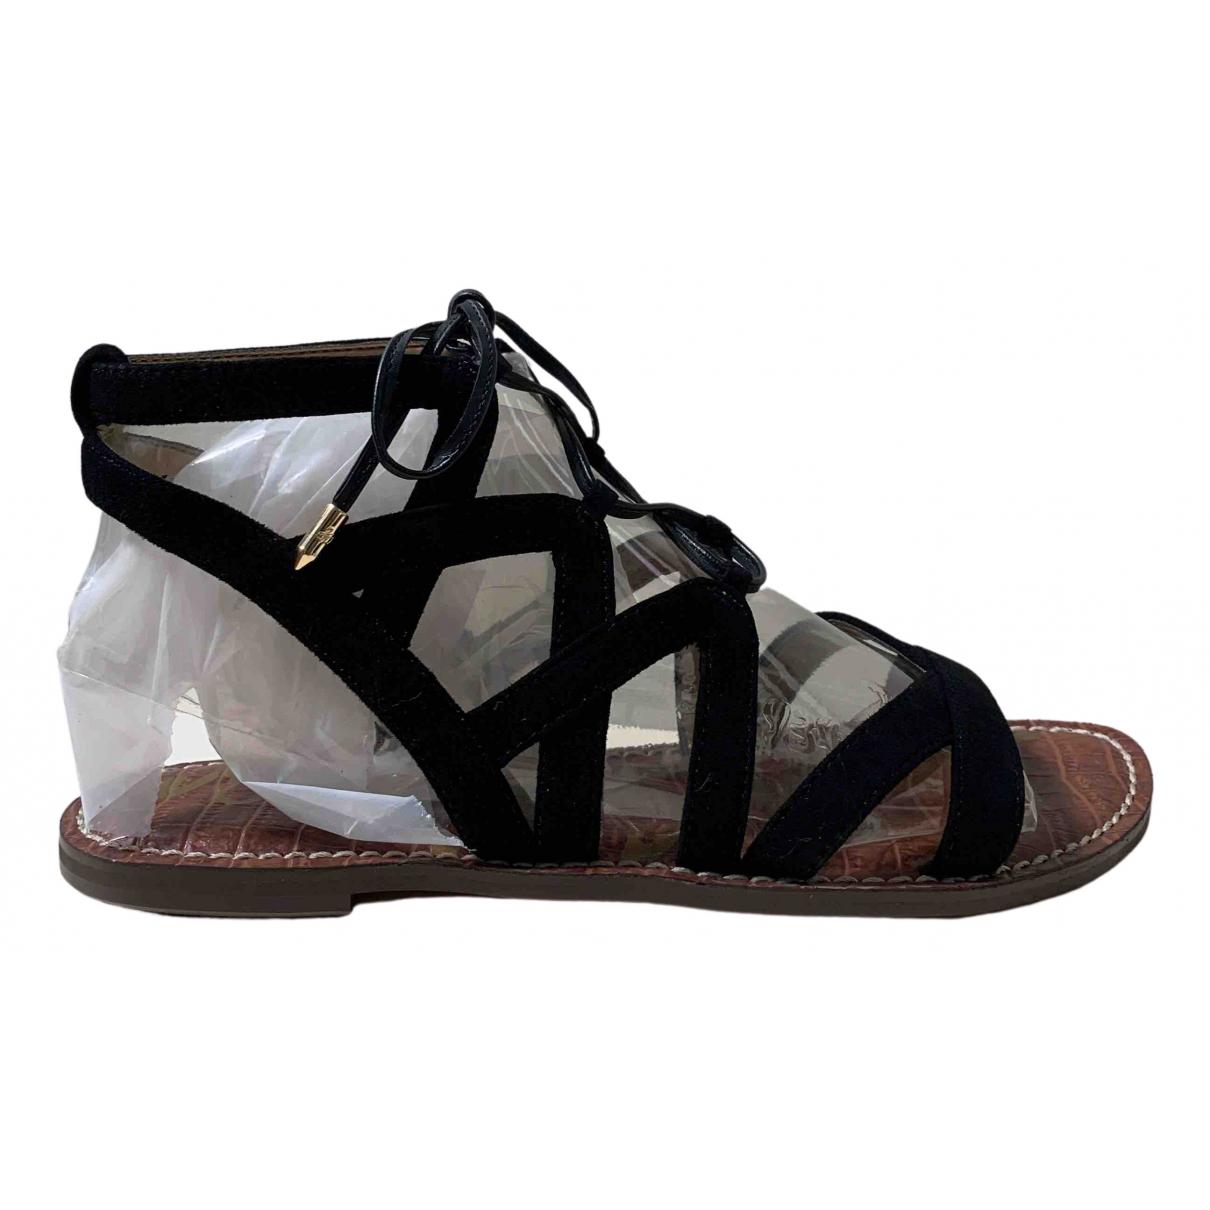 Sam Edelman \N Black Suede Sandals for Women 37.5 EU